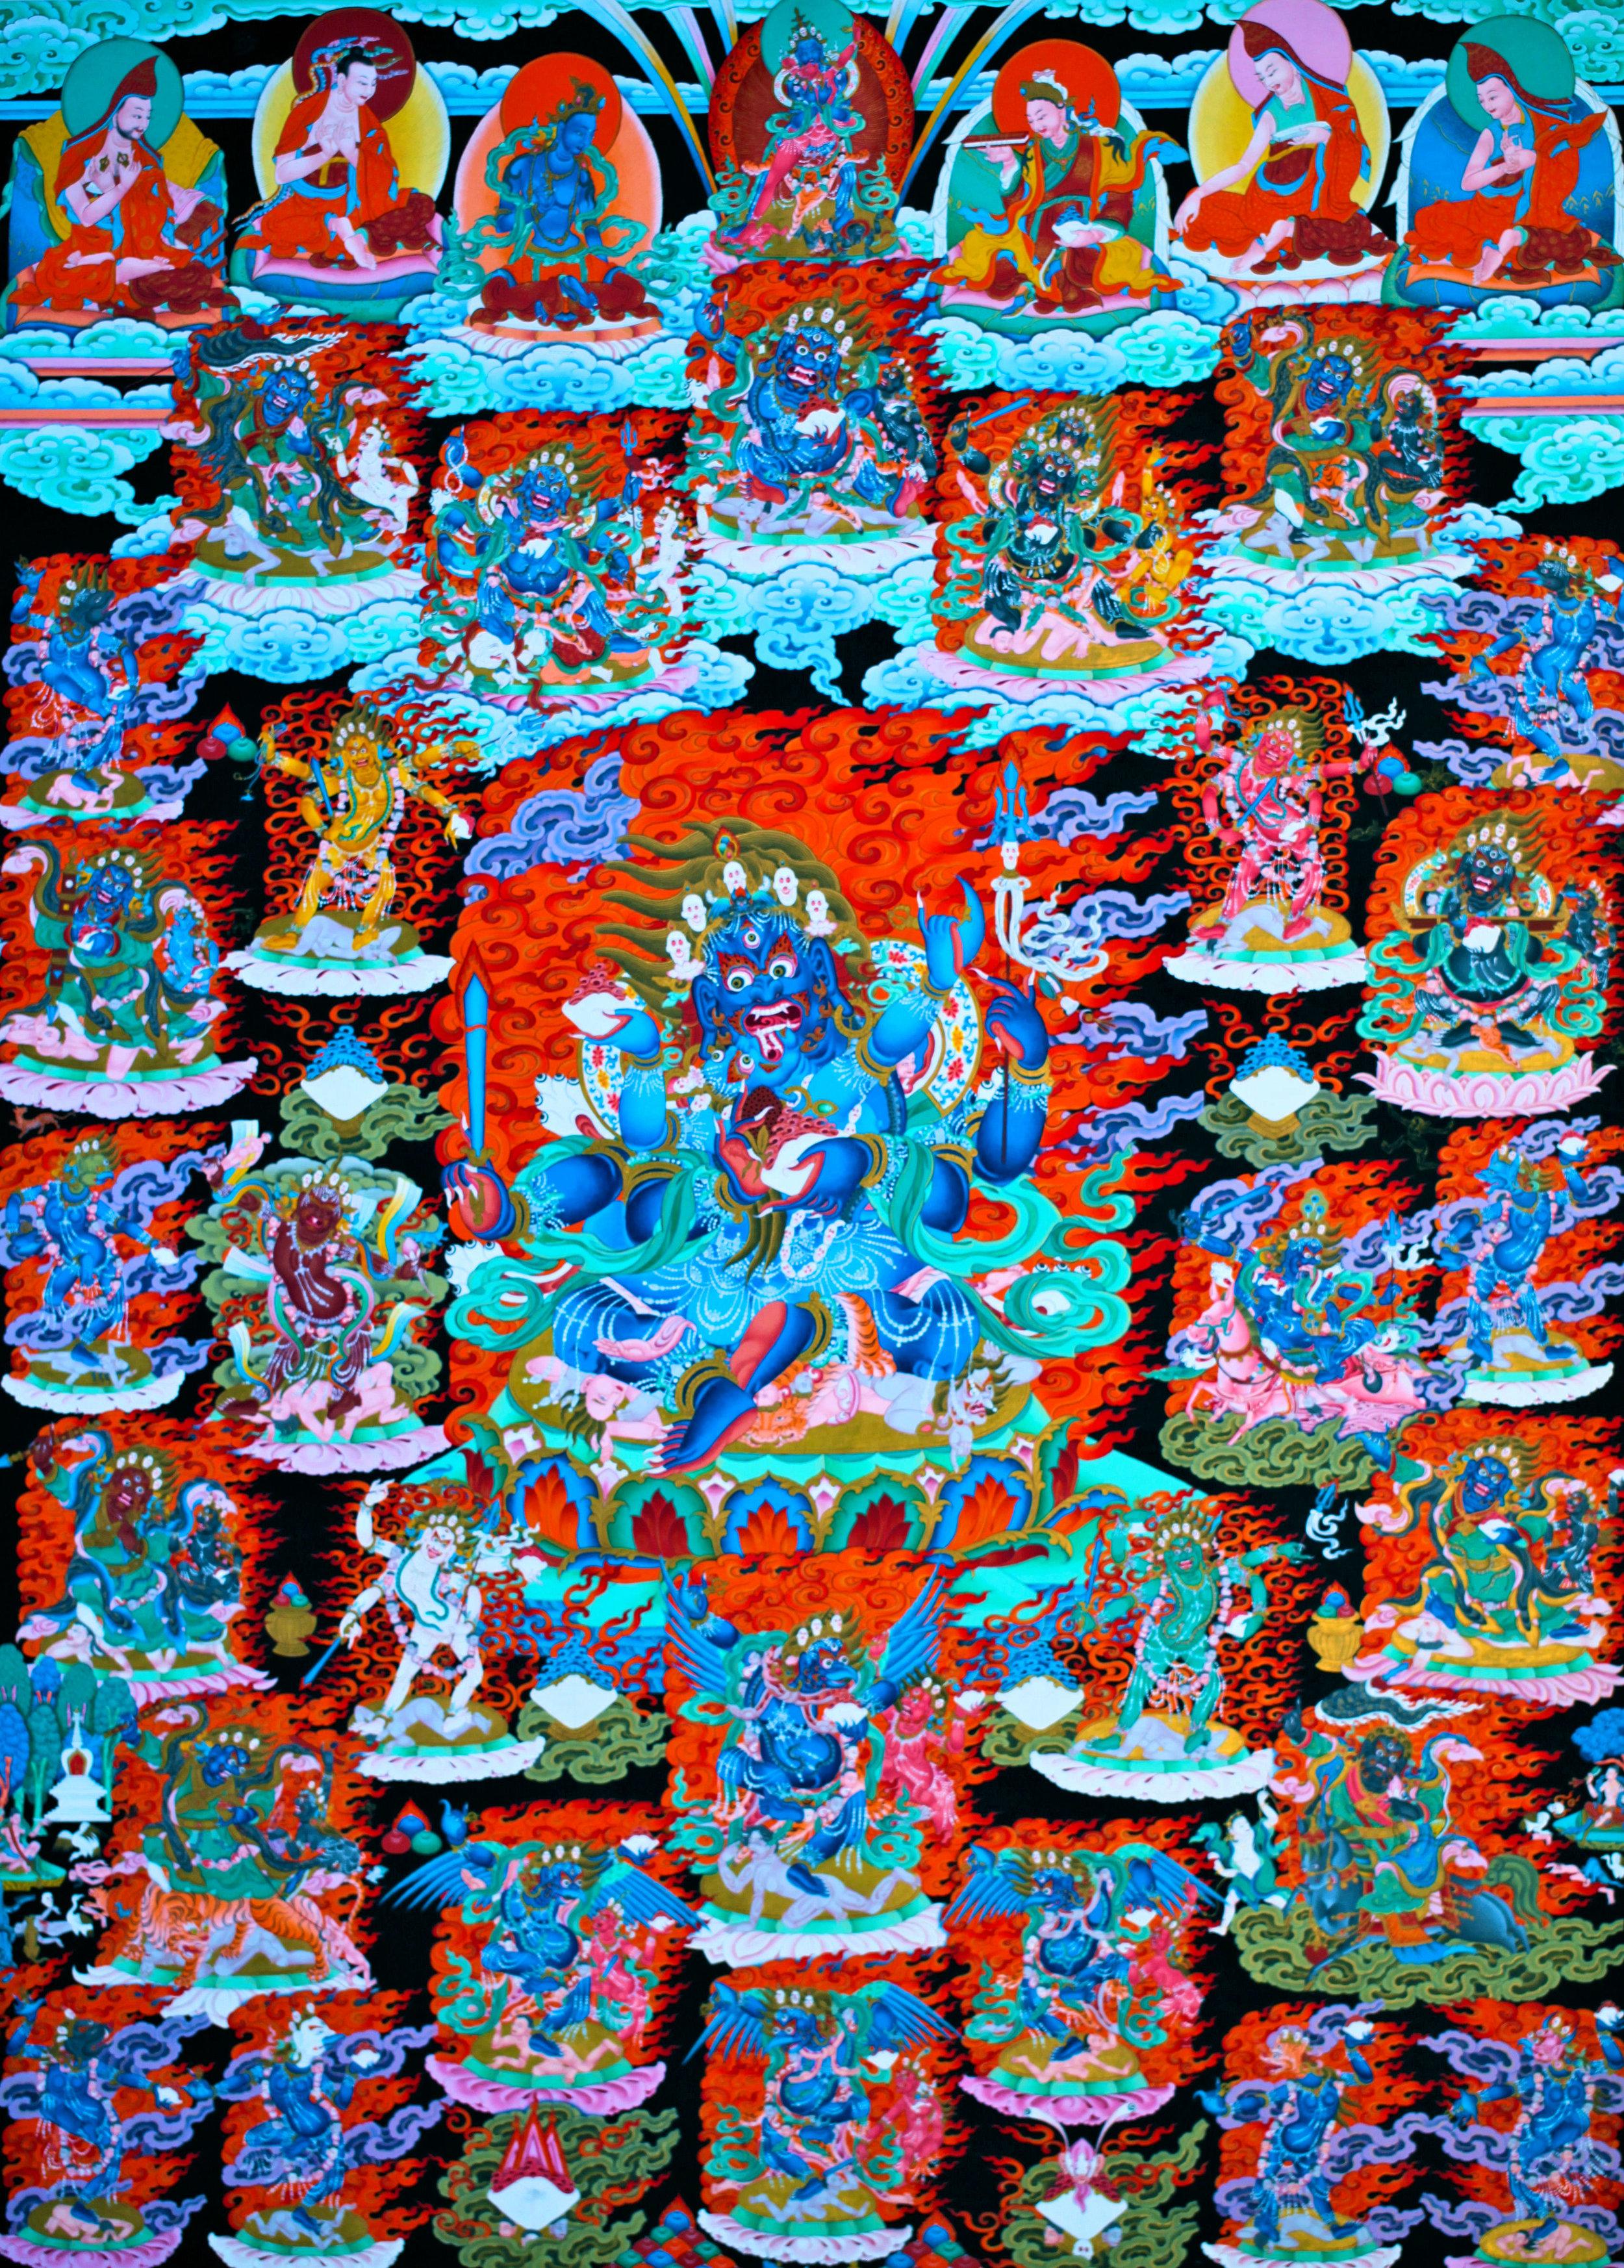 Dechen Choekhor's Four-armed Mahakala thangka